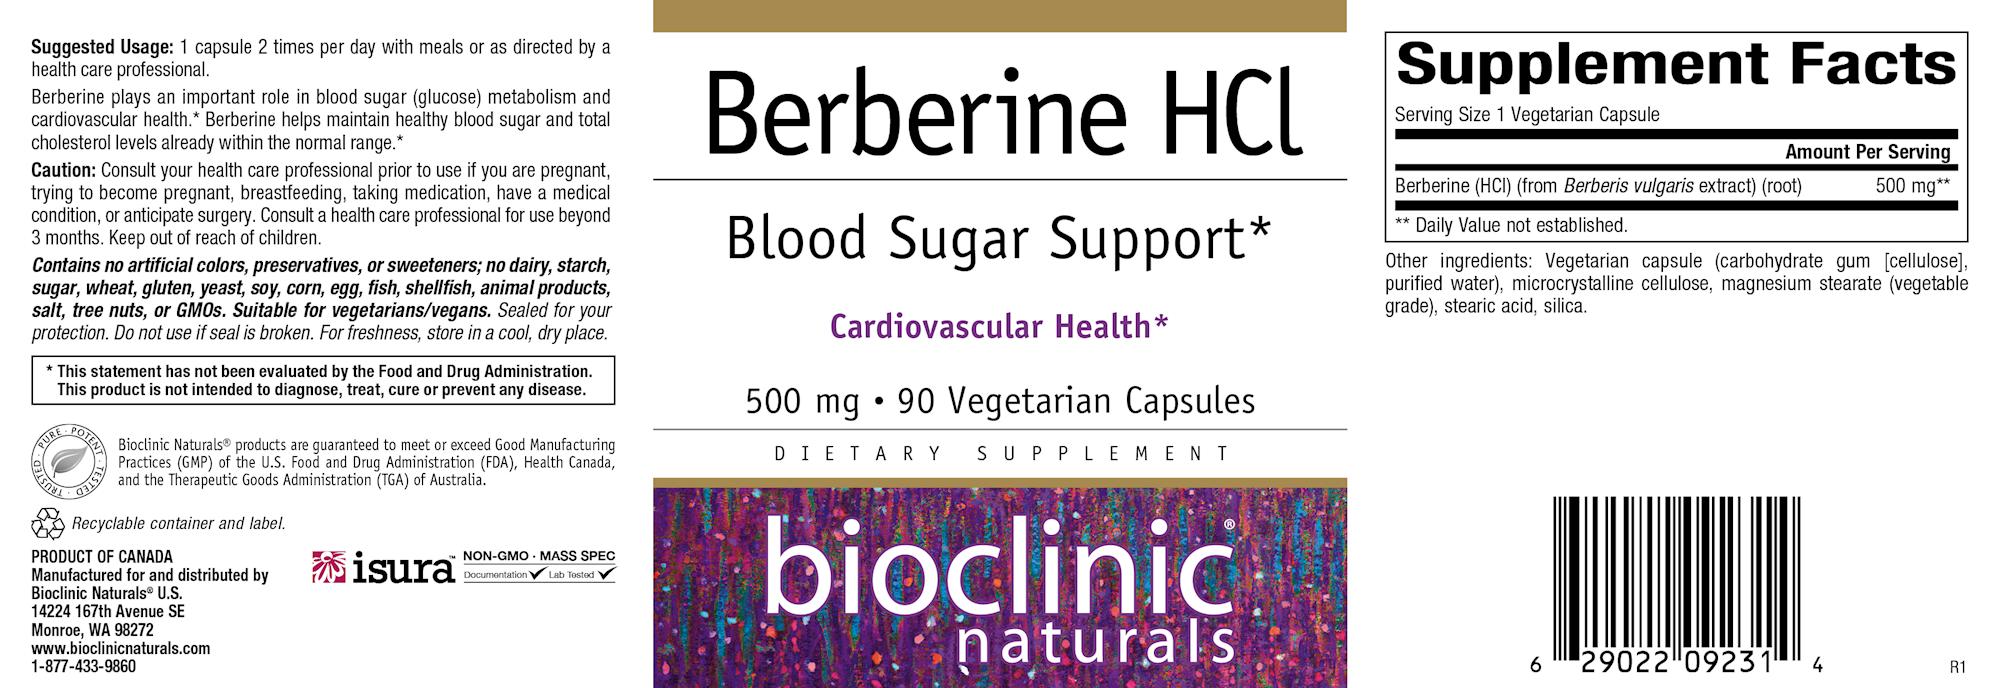 Berberine HCL 90 vegcaps